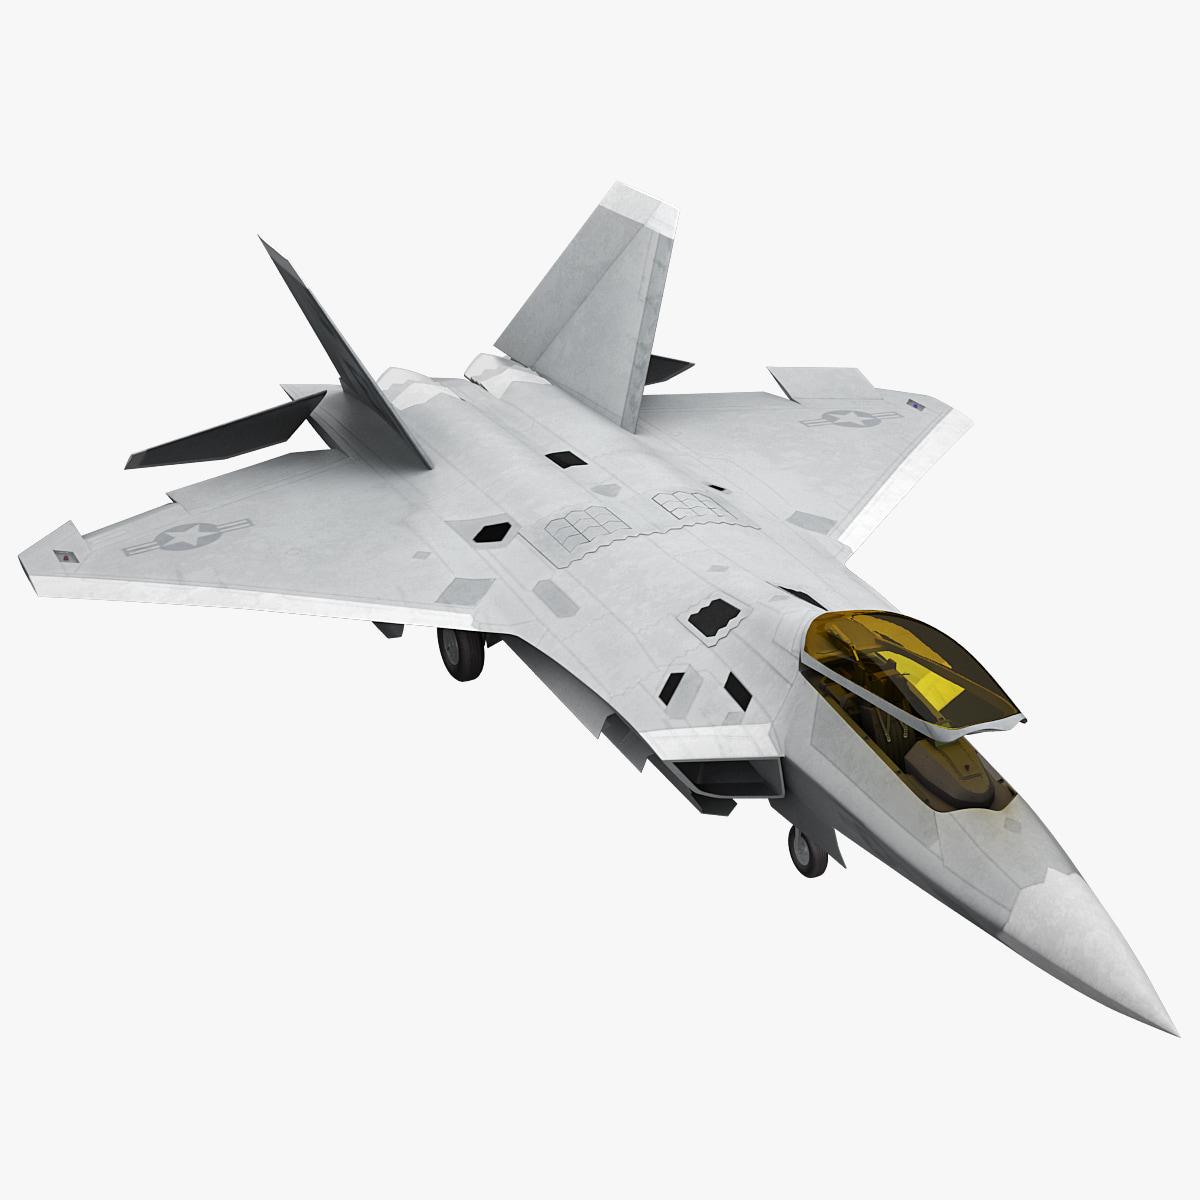 F-22_Raptor_V2_Rigged_0002.jpg